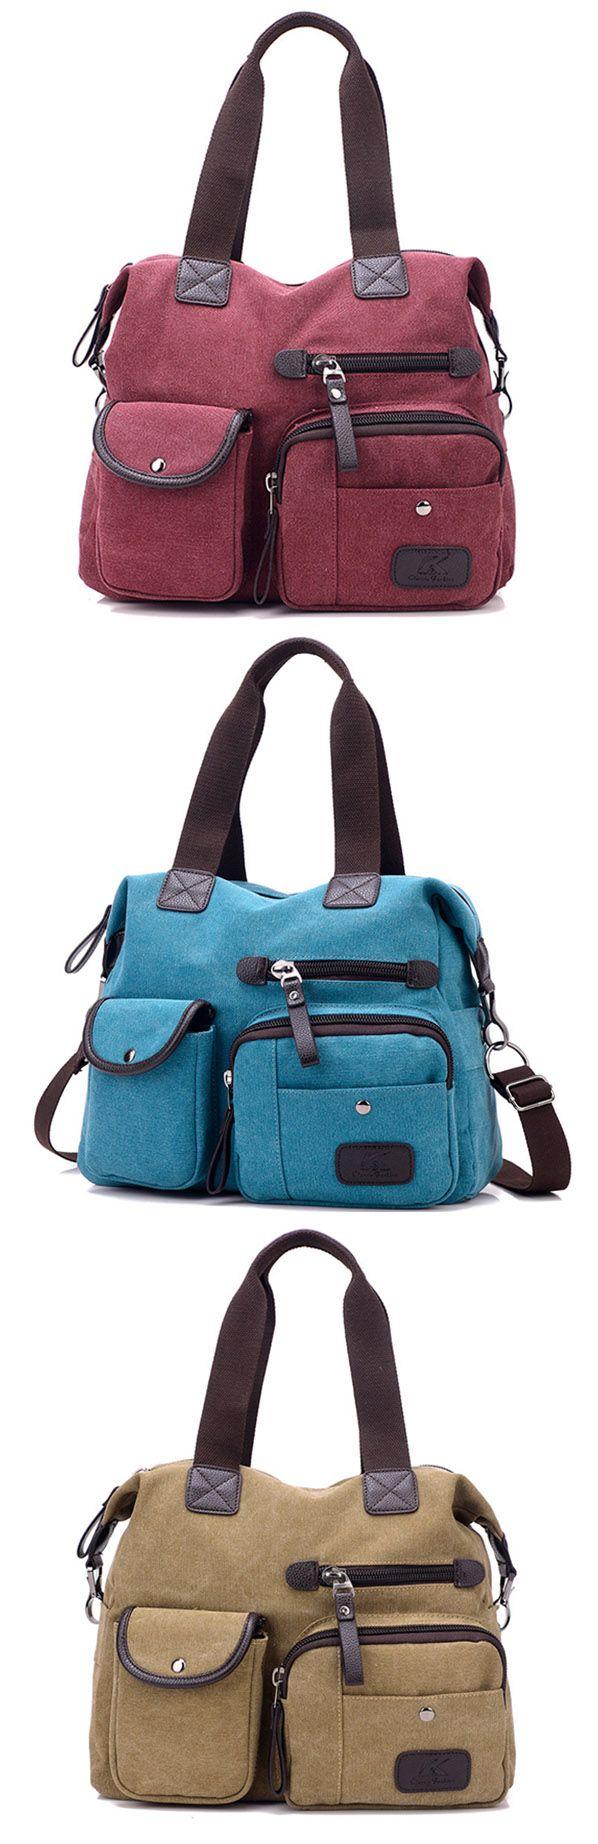 Women Canvas Large Capacity Sport Travel Casual Handbag Crossbody Shoulder Bag.